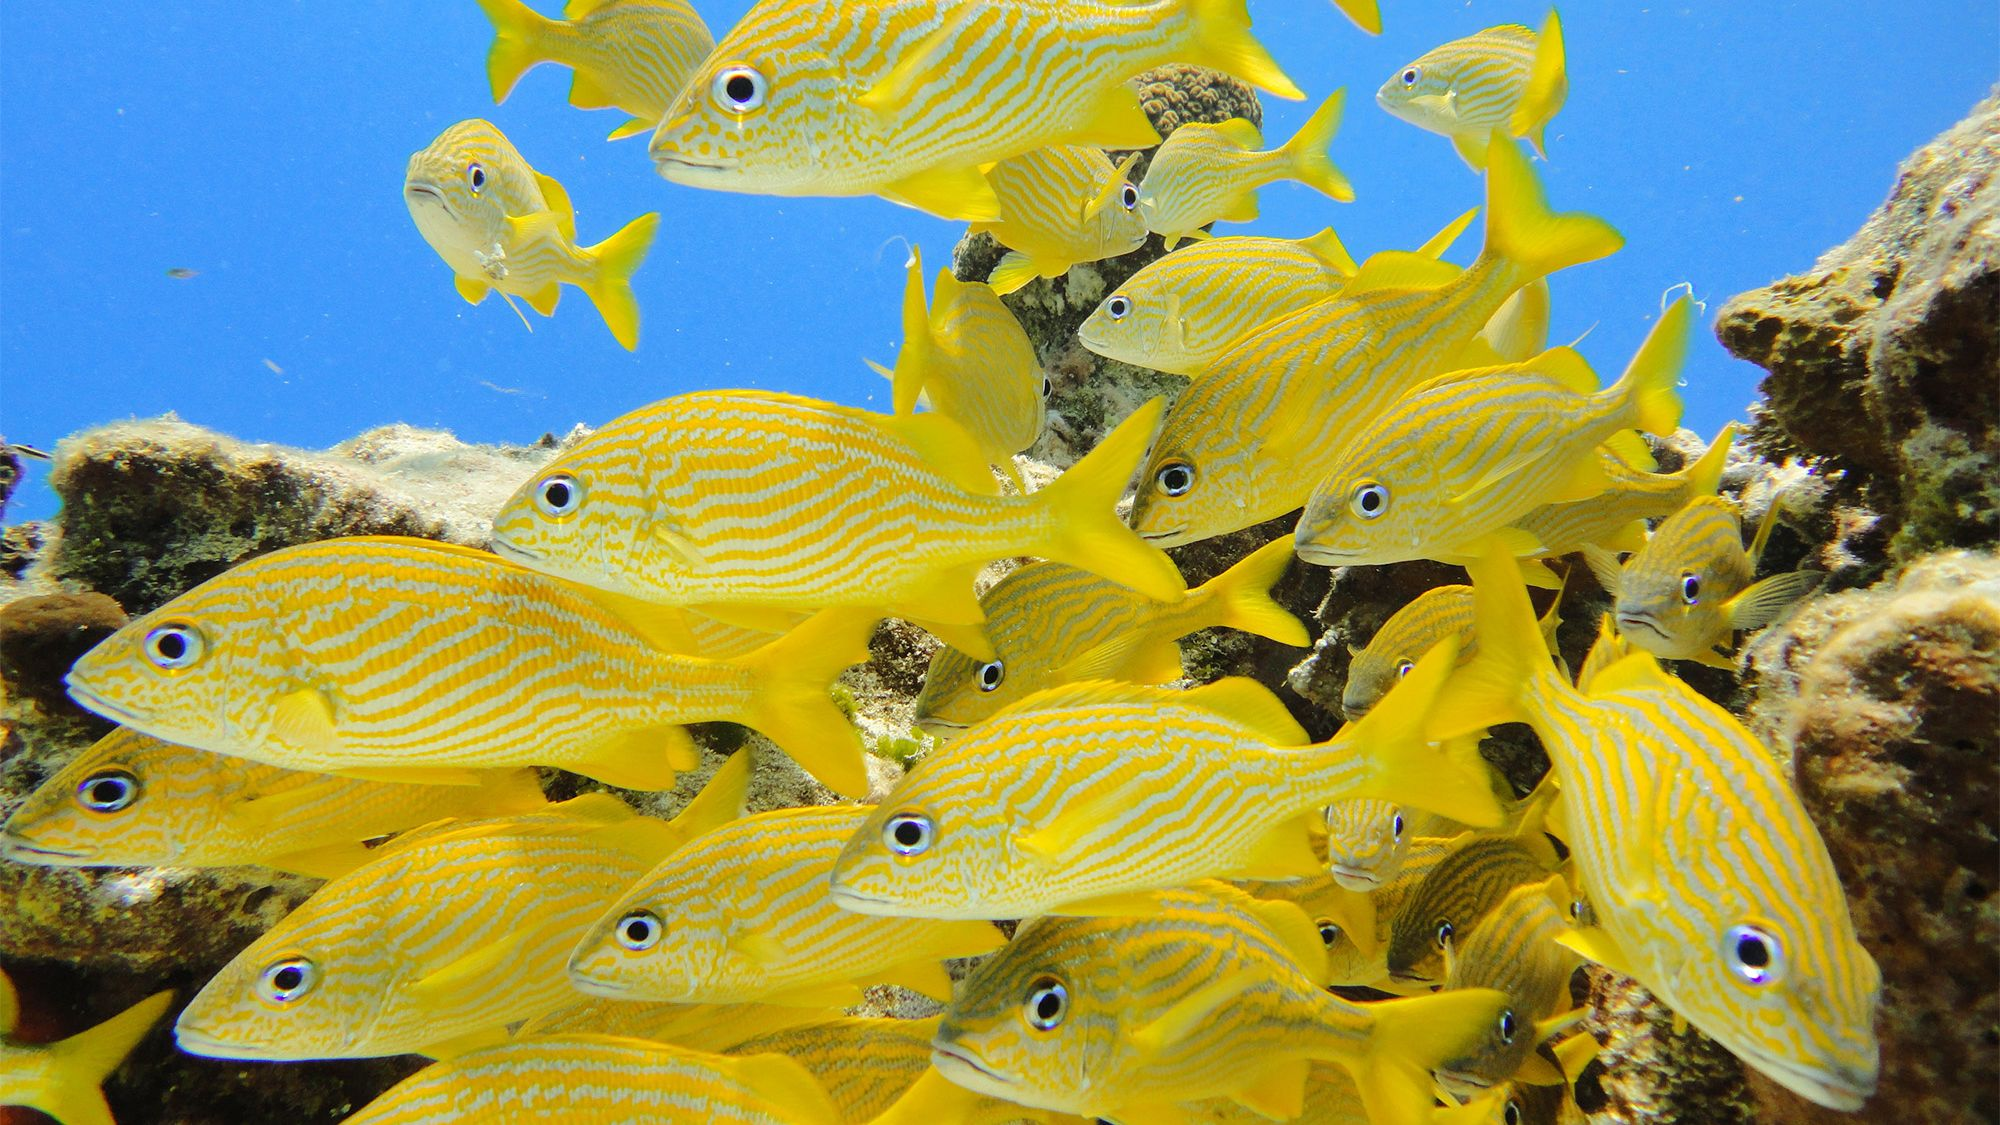 School of bright yellow fish in Cozumel